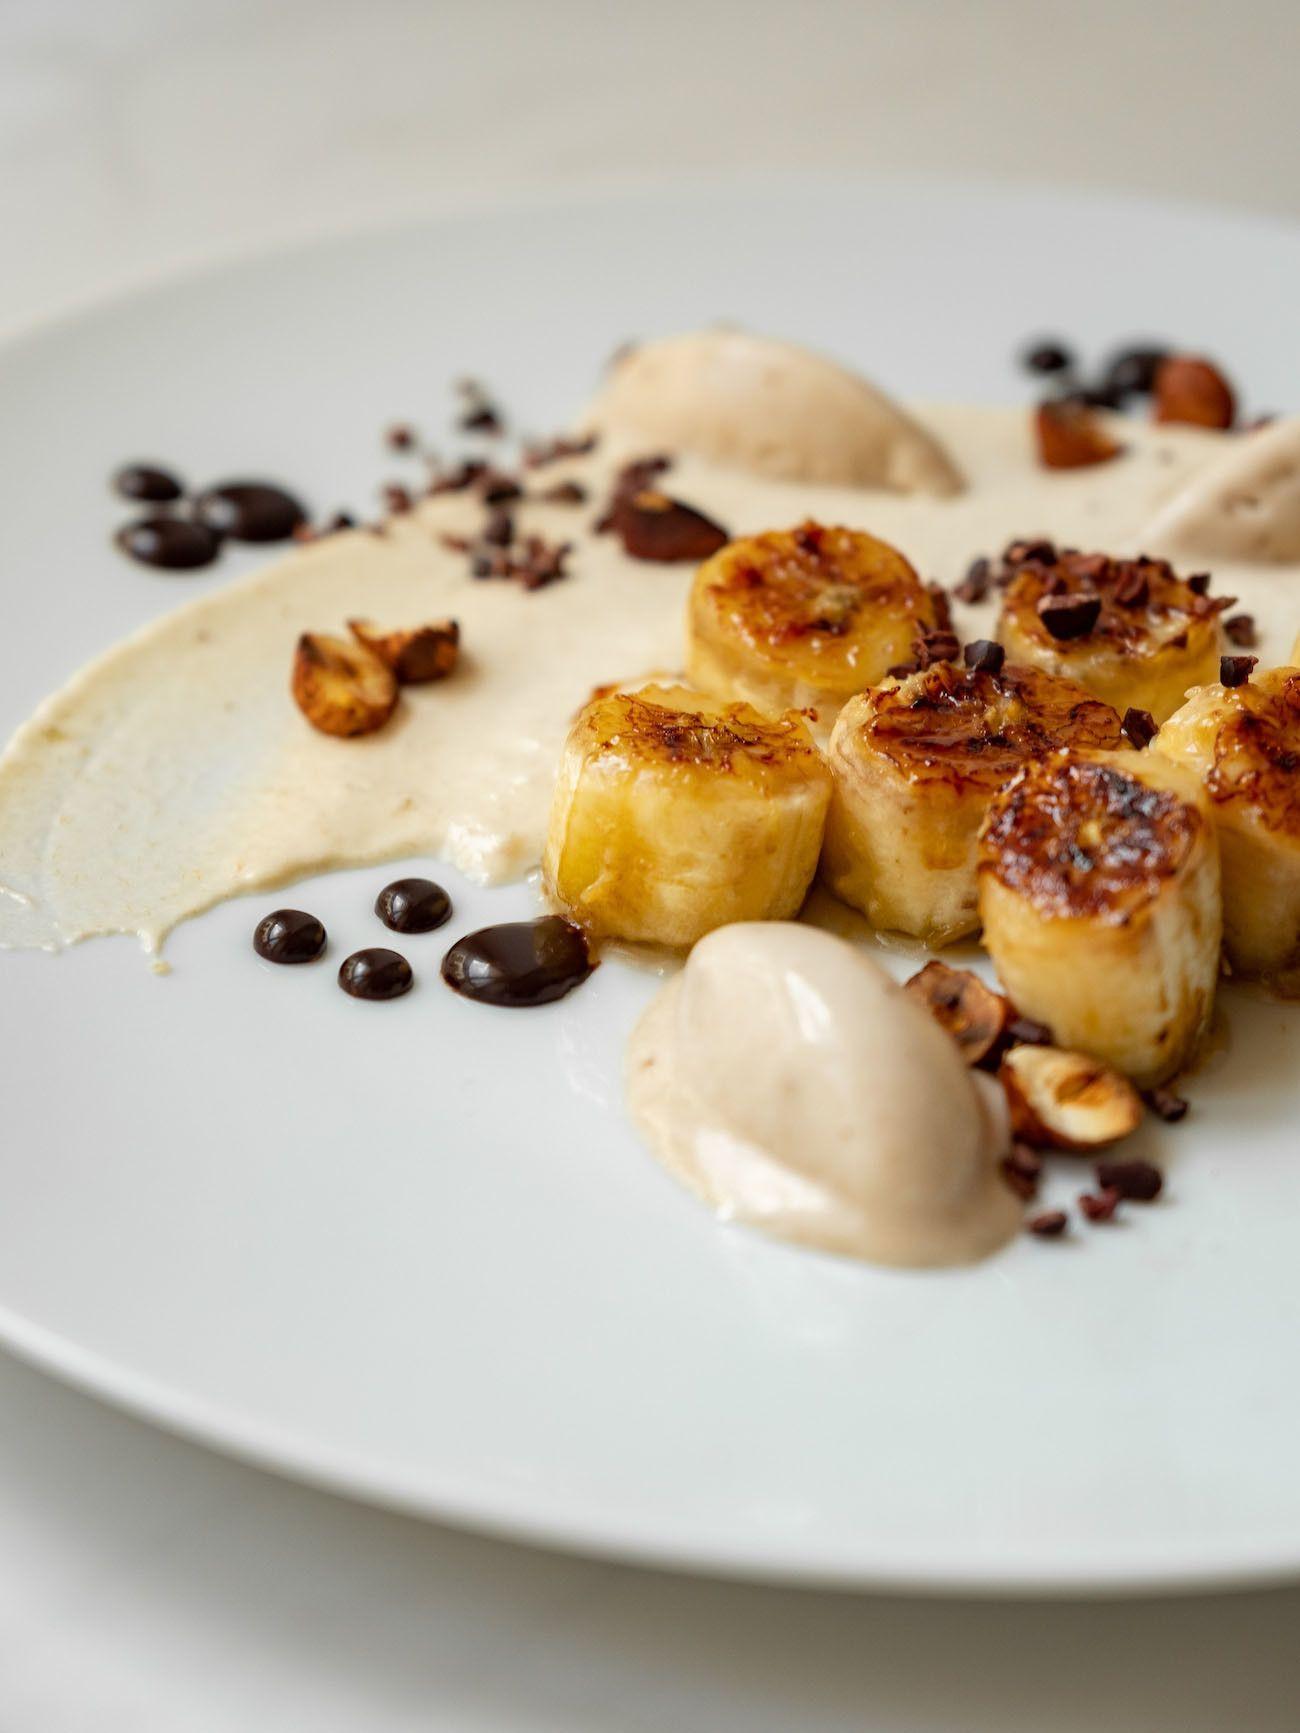 Foodblog, About Fuel, Rezept, Rum Bananen Dessert mit Hasenüssen und Schokoladen-Karamell, Bananeneis, Teller, Kakao Nibs